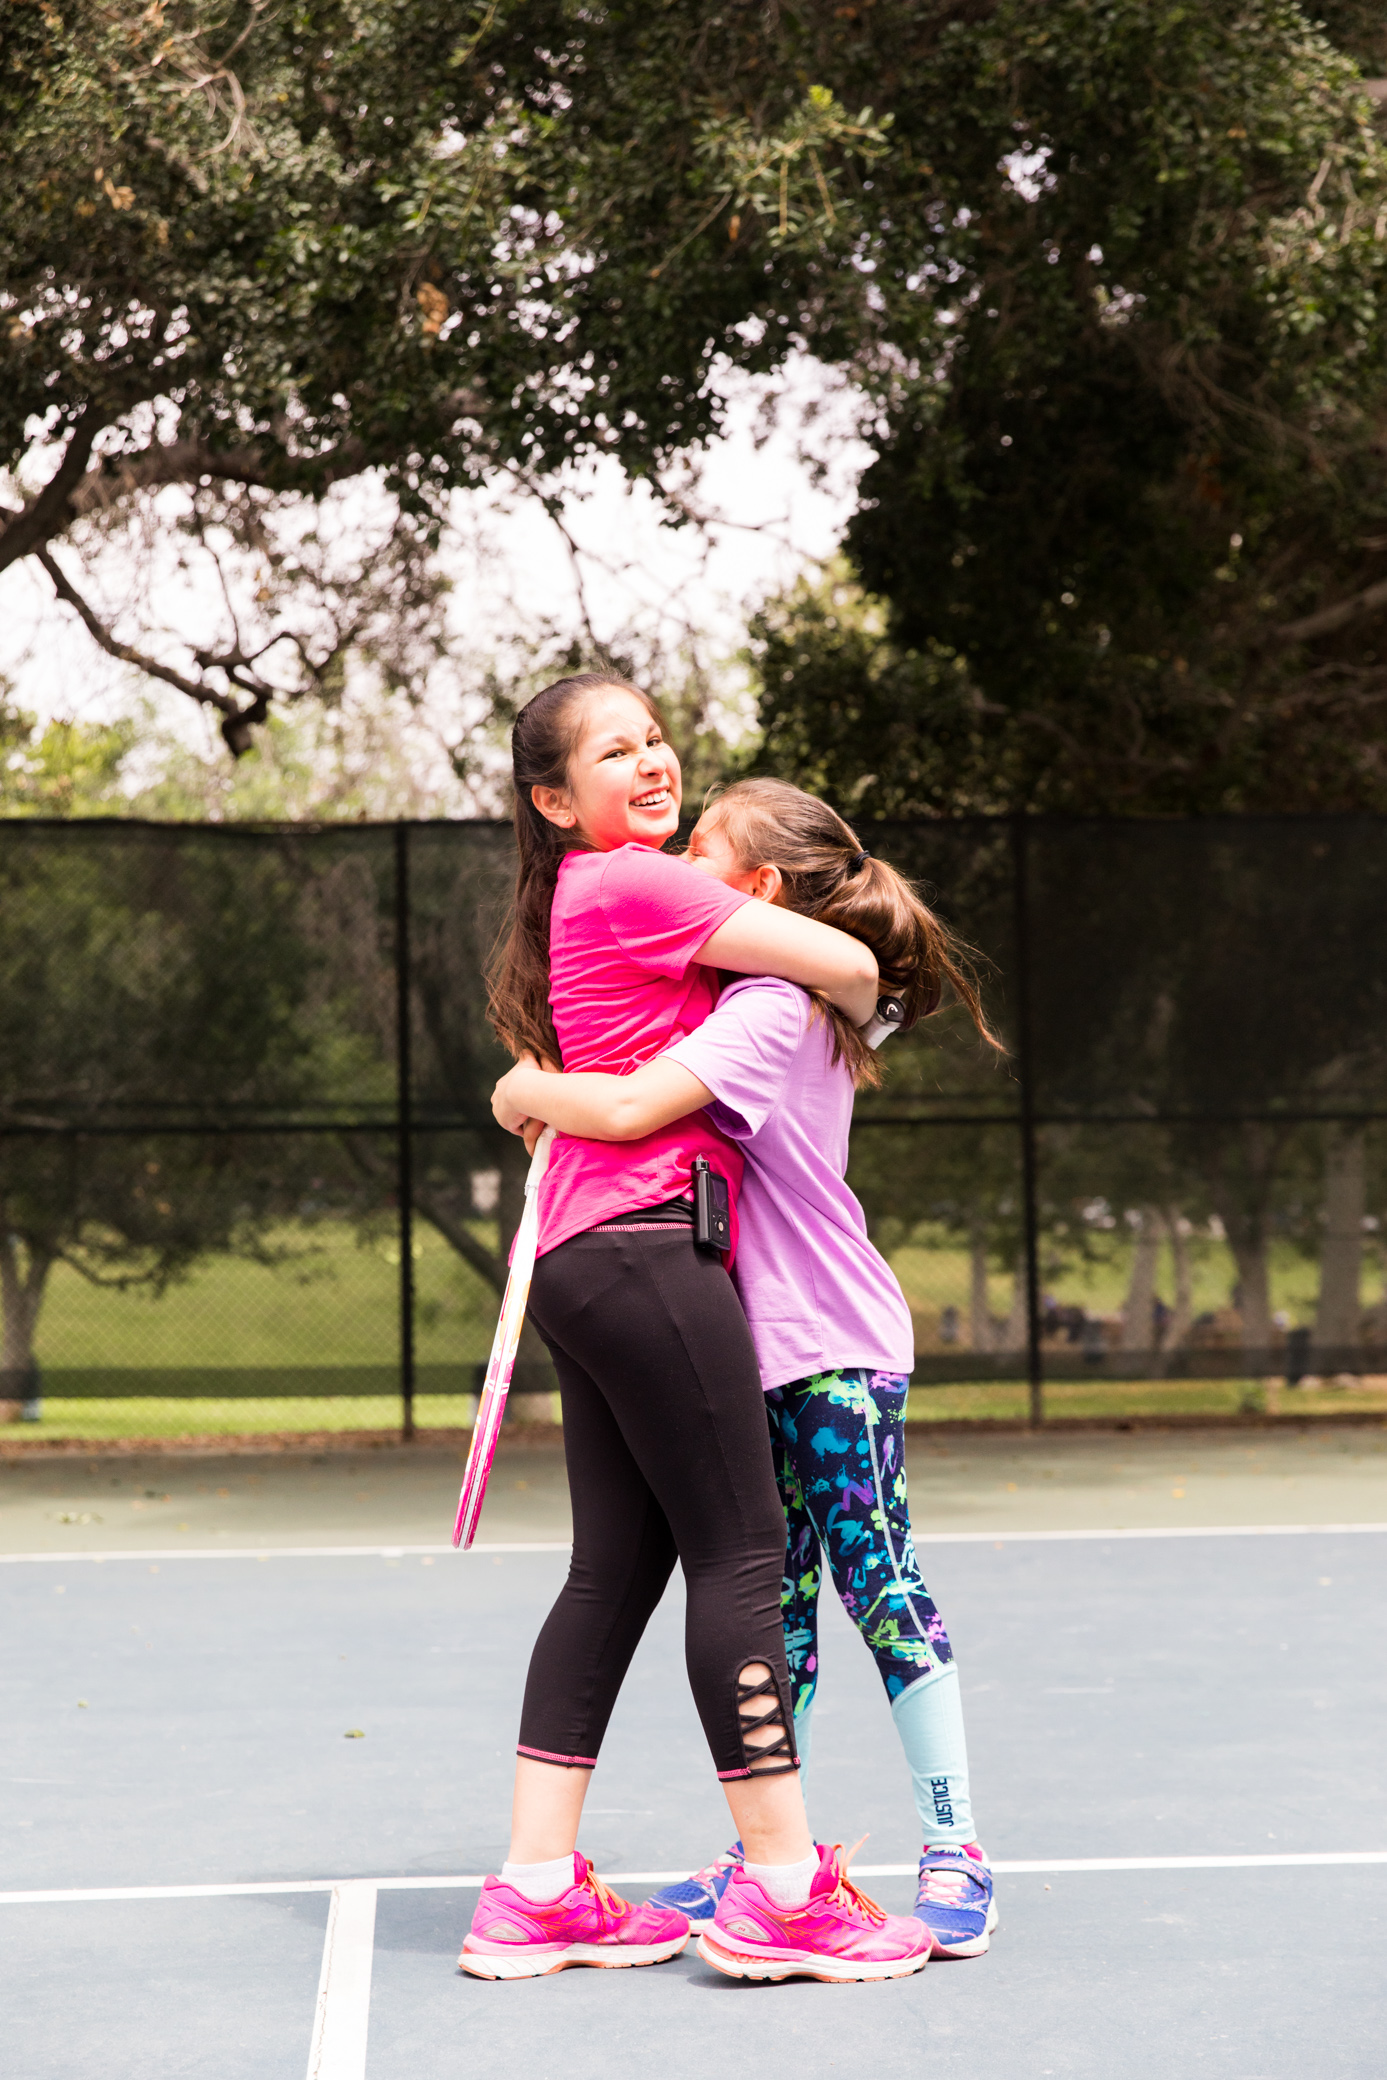 Medtronic-LA-Tennis-137.jpg